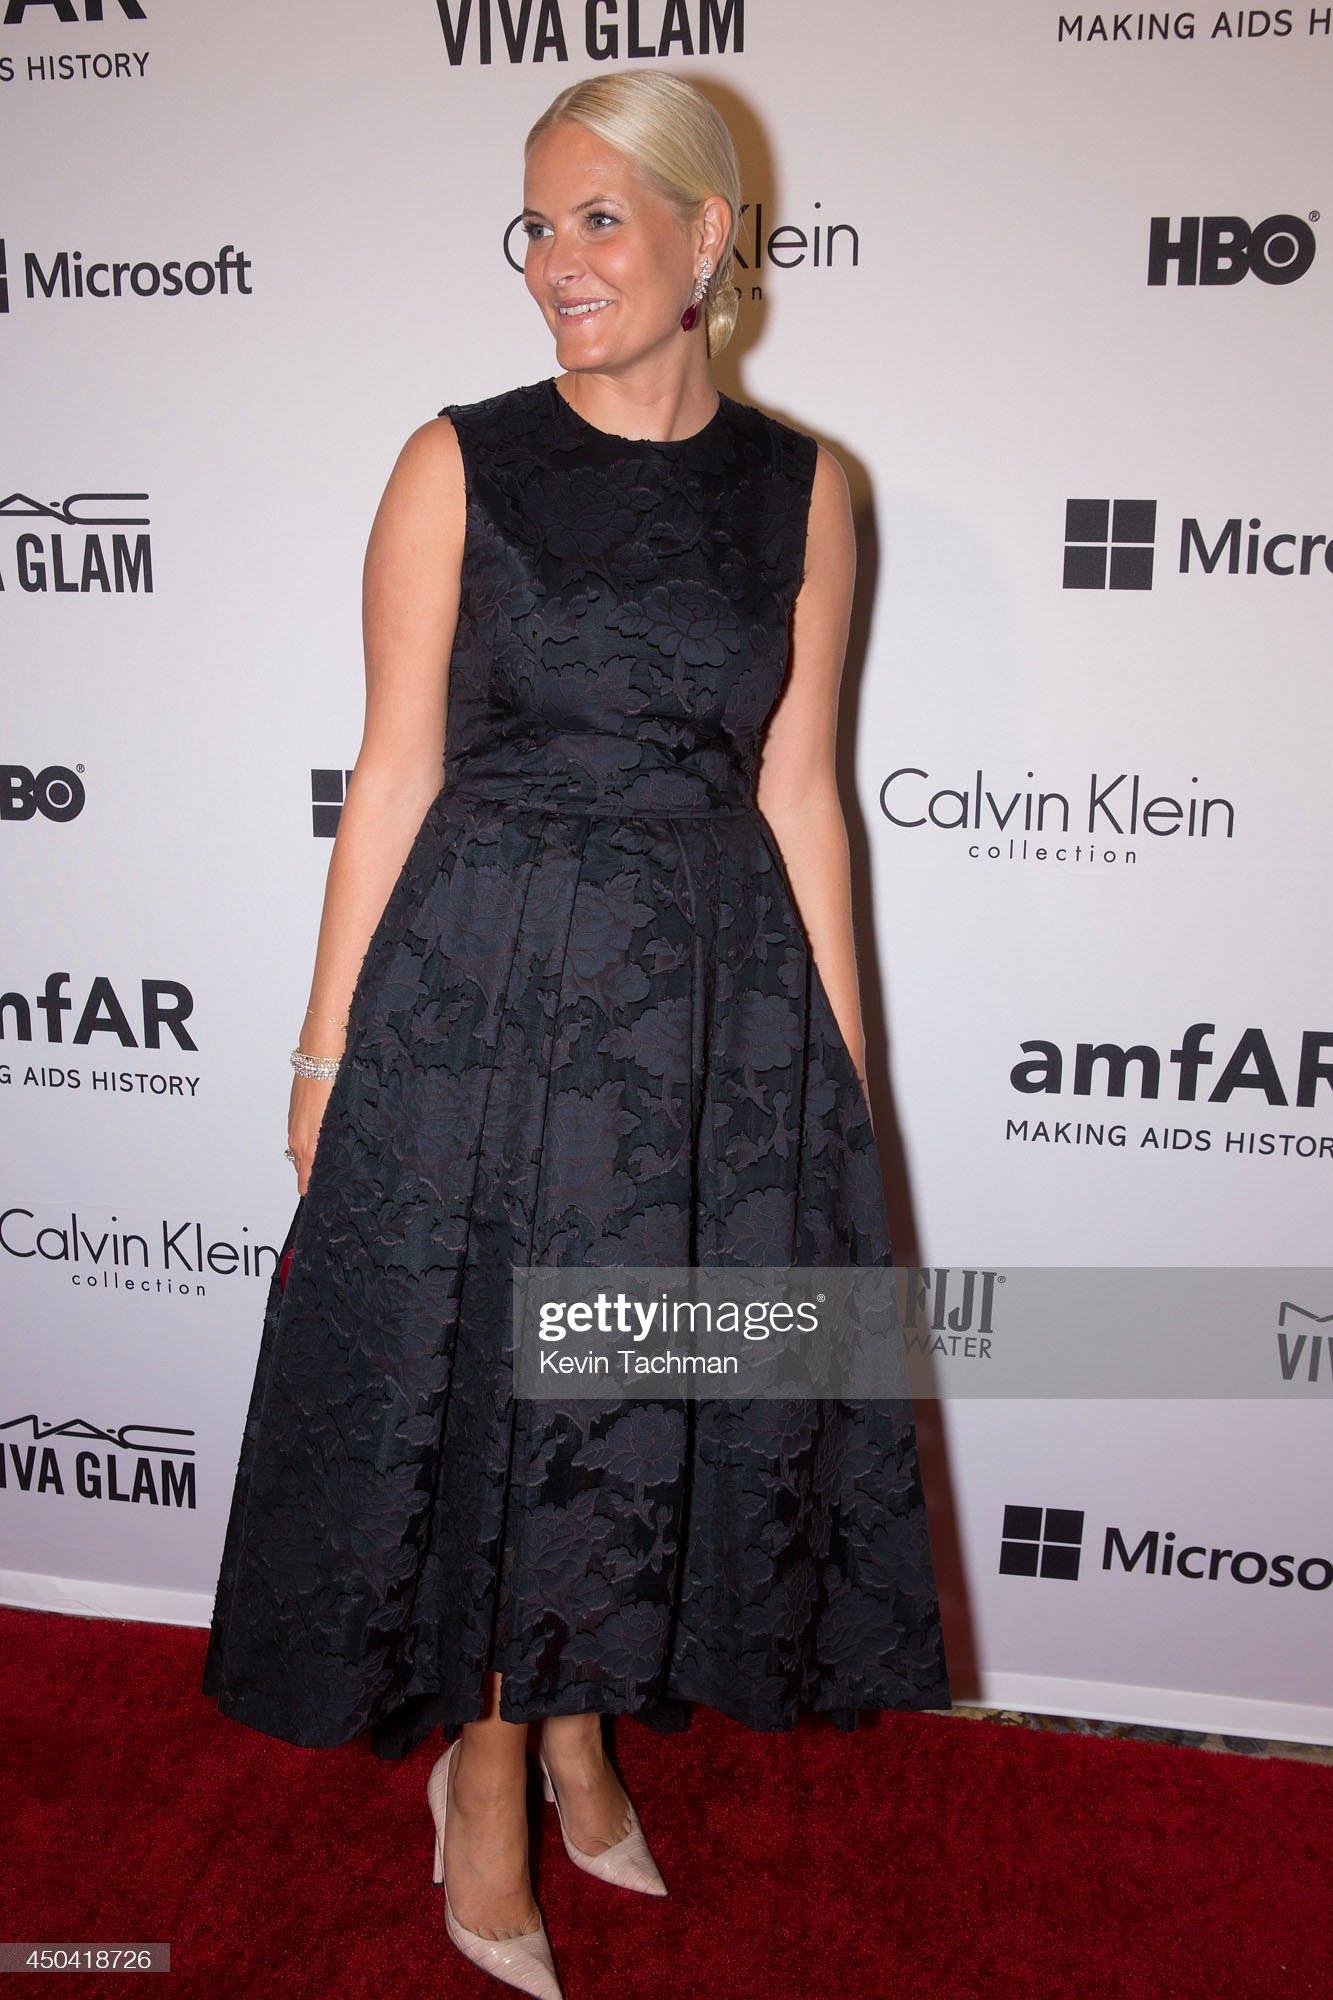 amfAR Inspiration Gala New York 2014 - Arrivals : News Photo